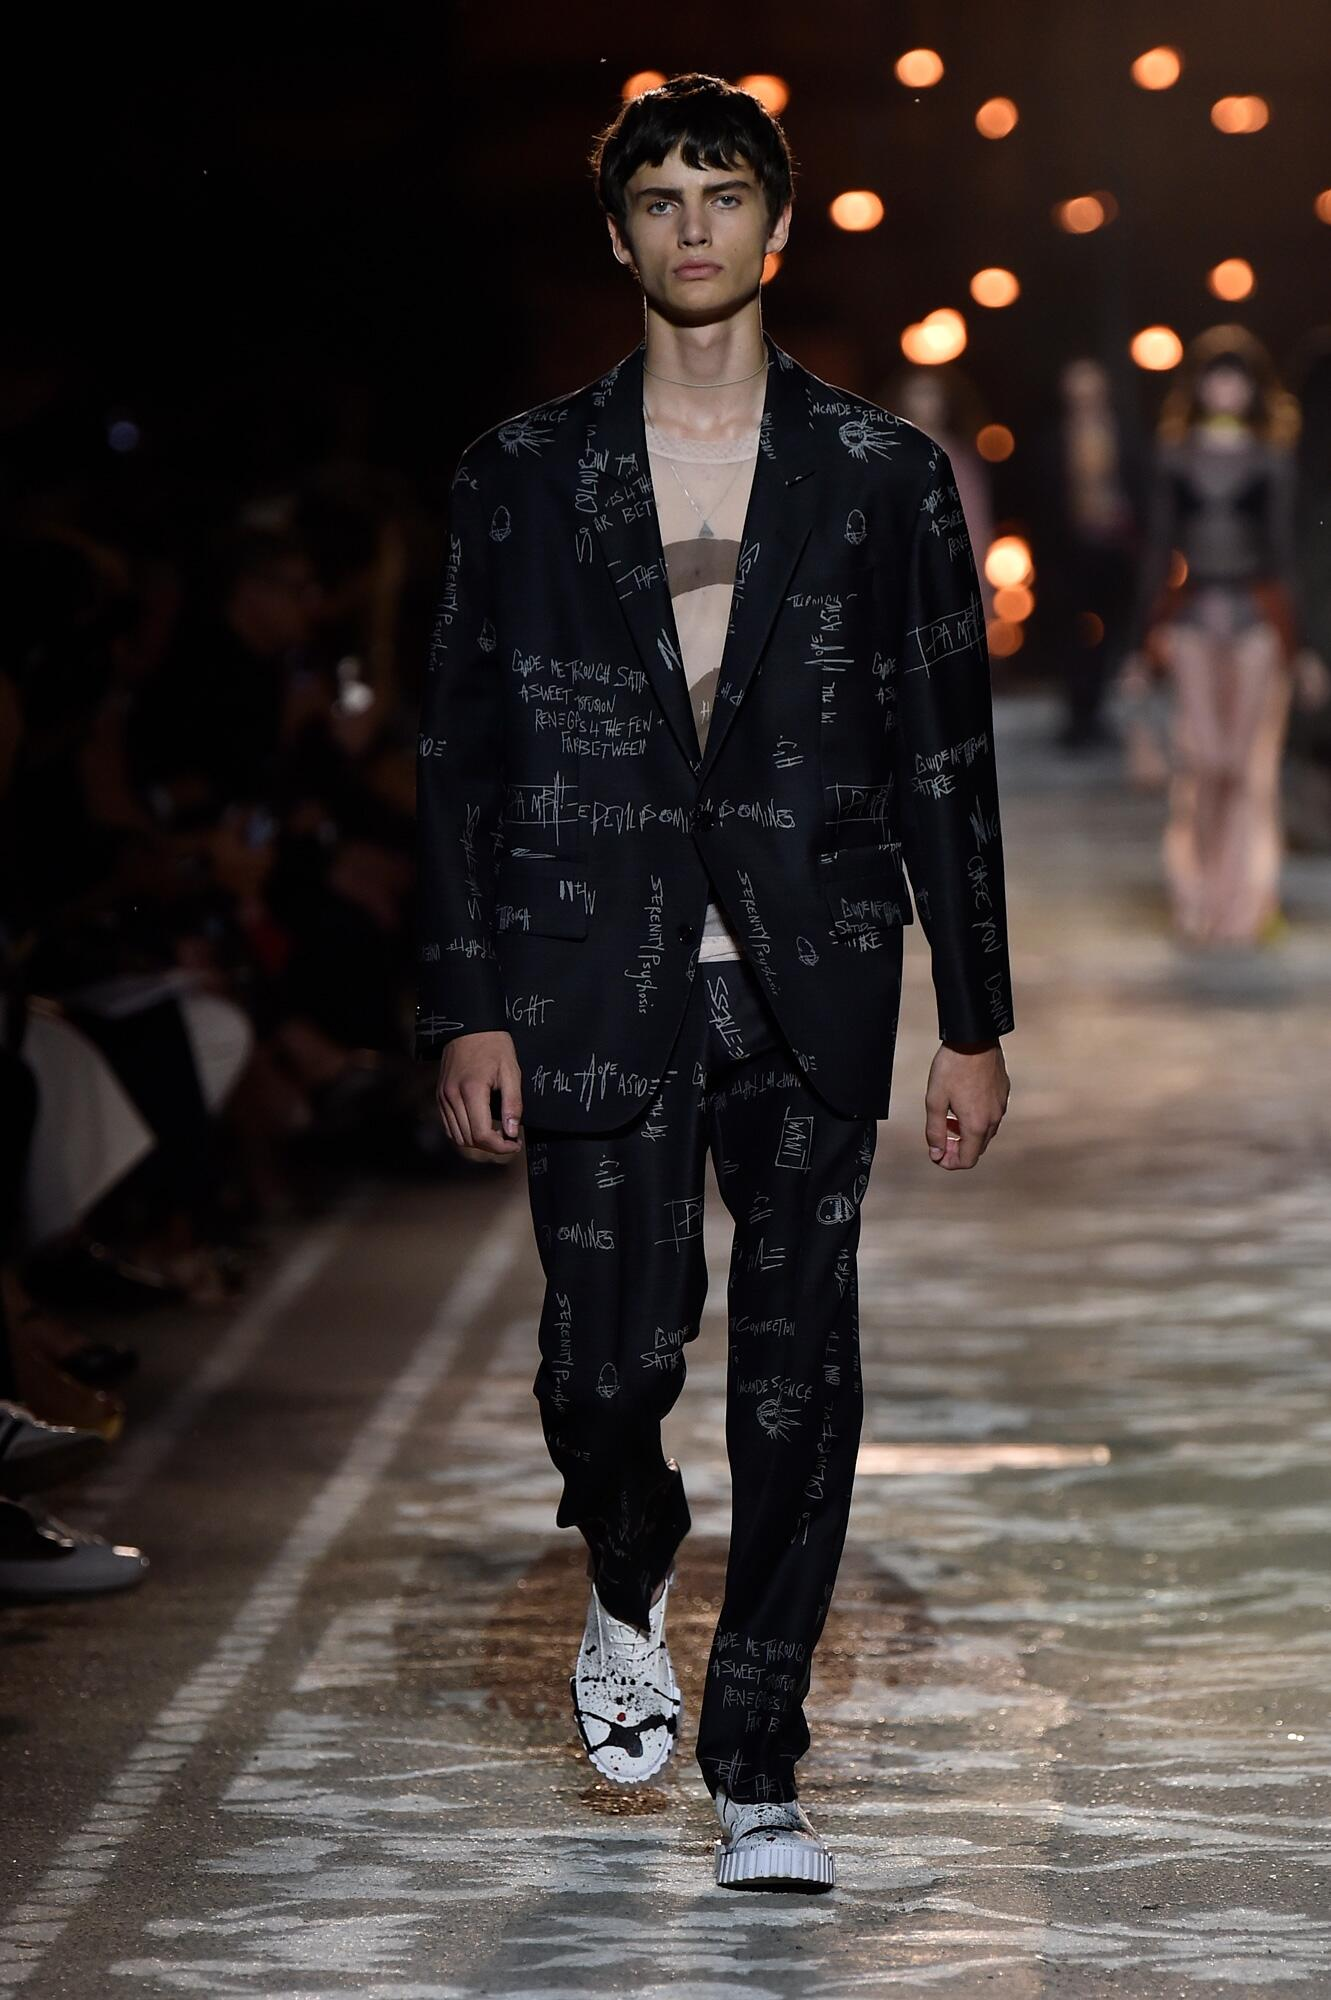 Spring Summer Fashion Man Trends 2018 Hugo